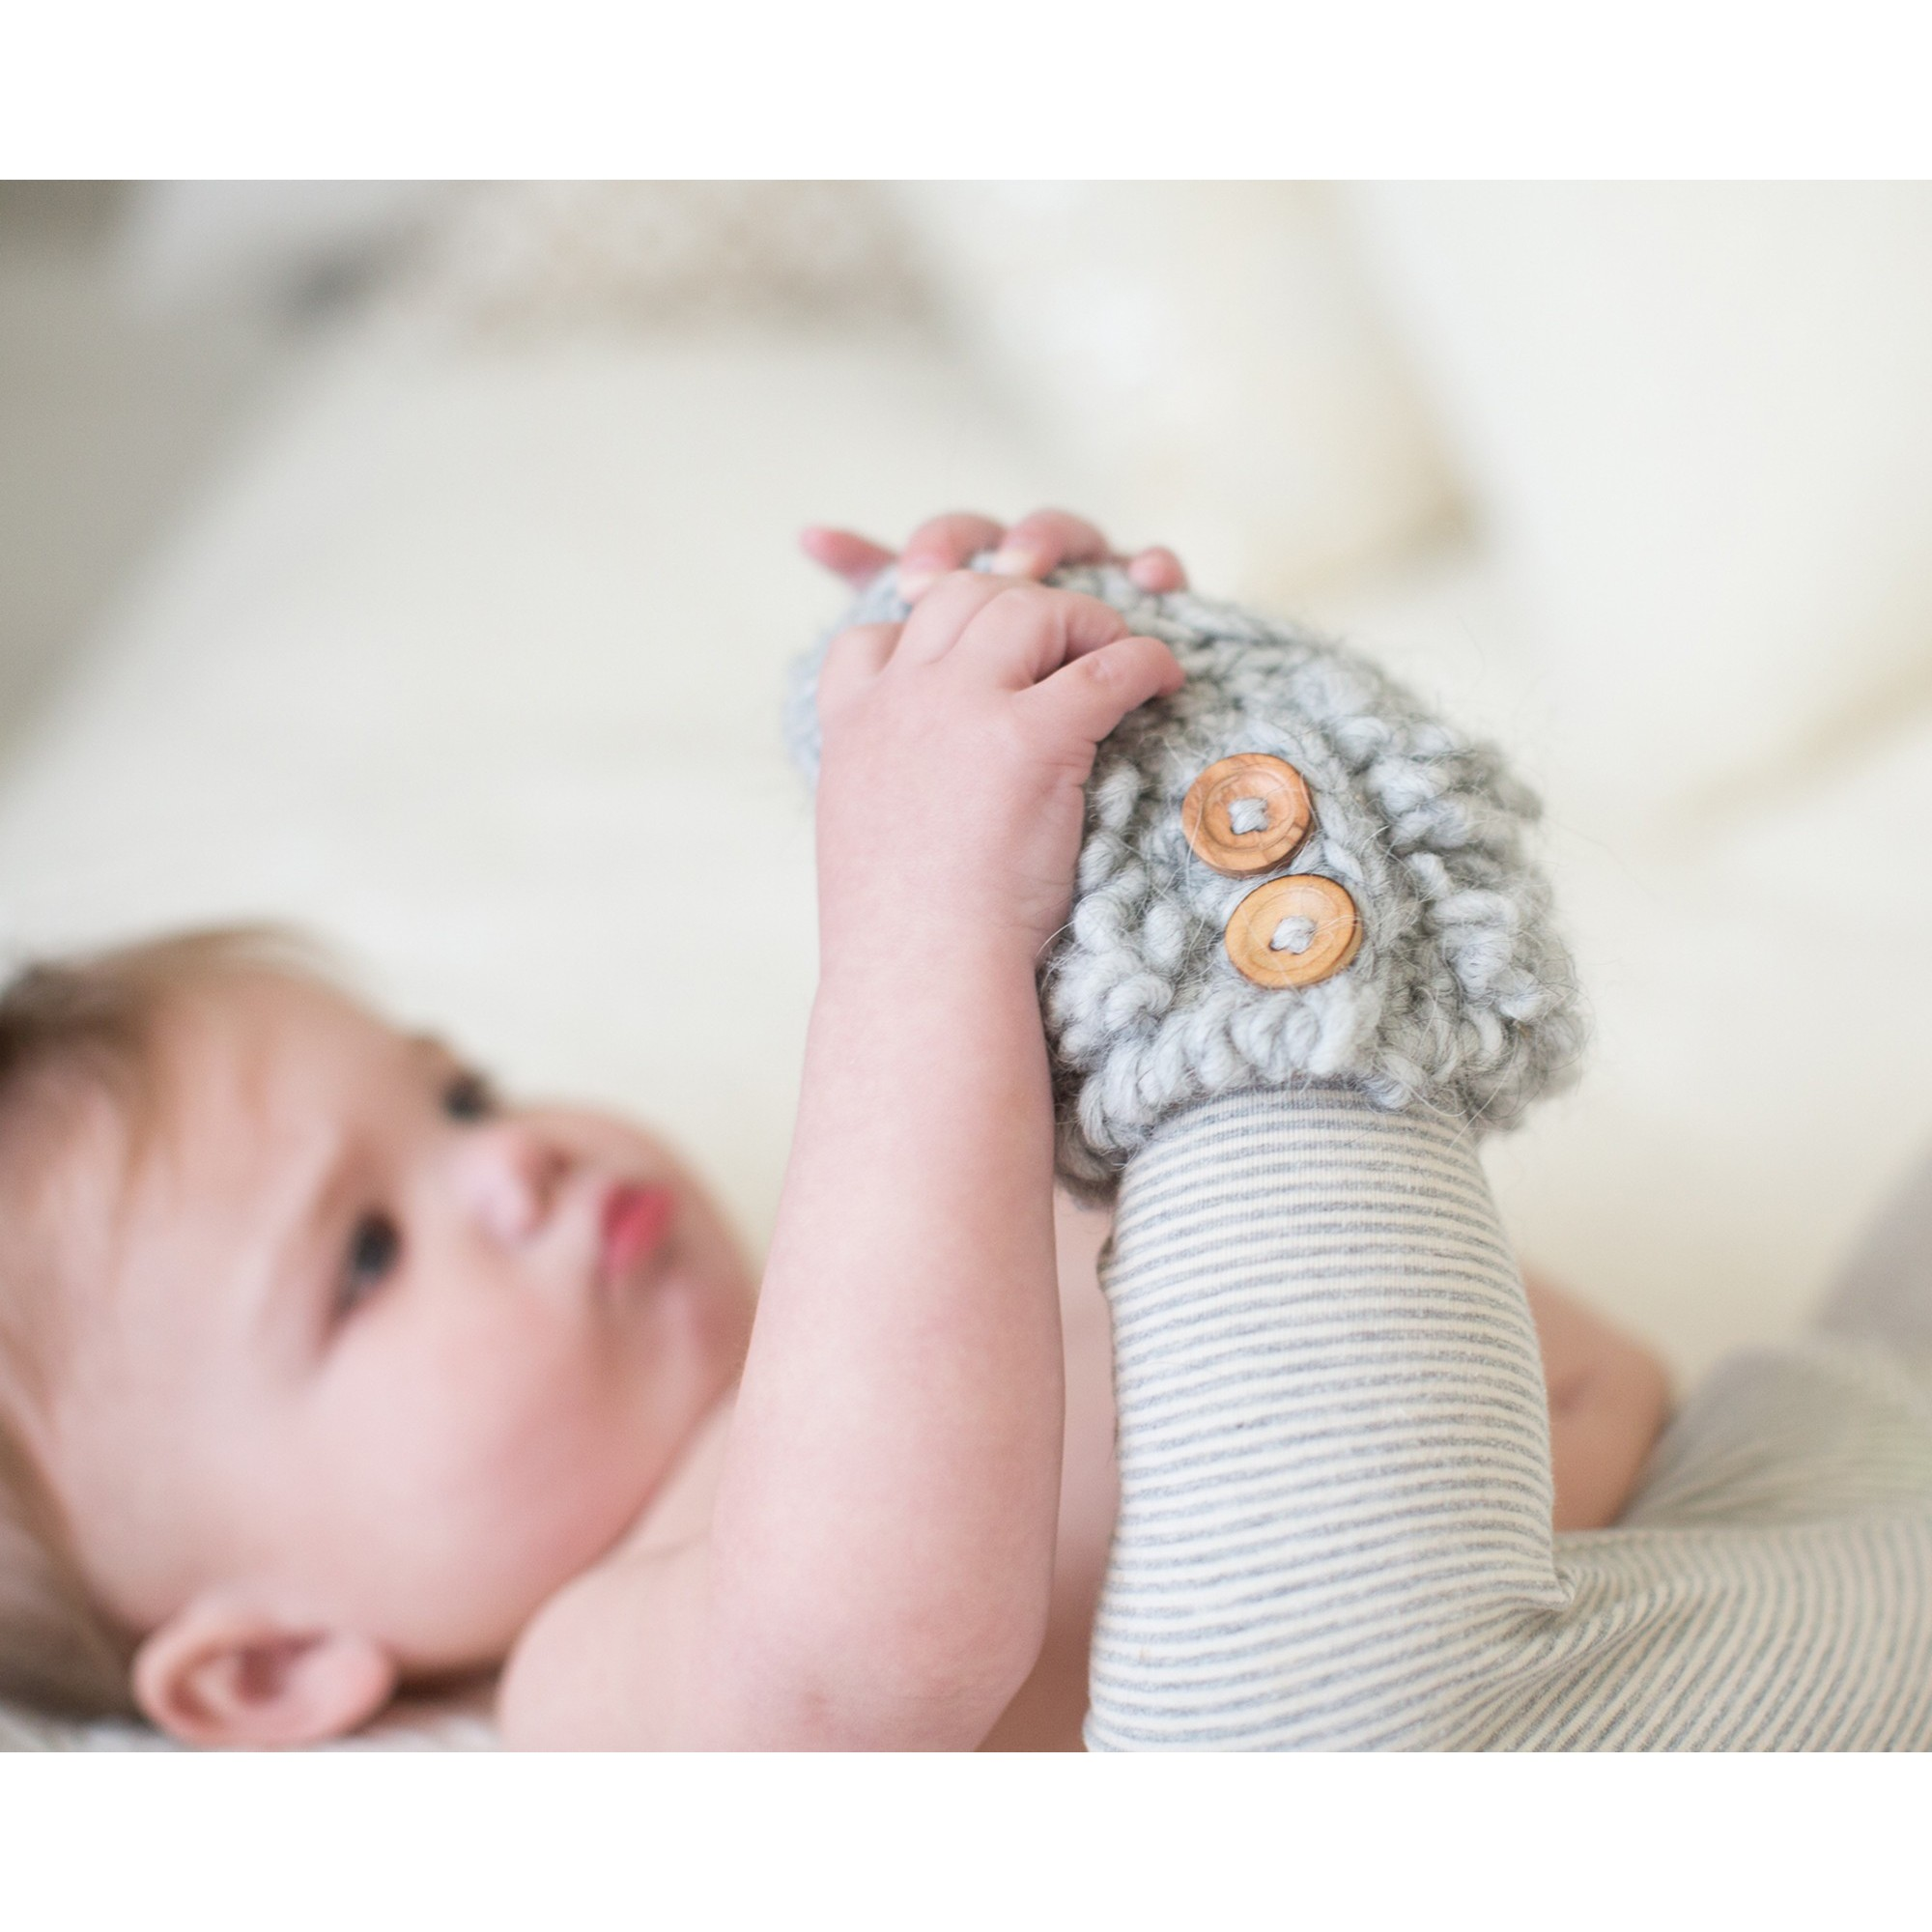 chaussons de b b au crochet coton blanc pictures to pin on pinterest. Black Bedroom Furniture Sets. Home Design Ideas